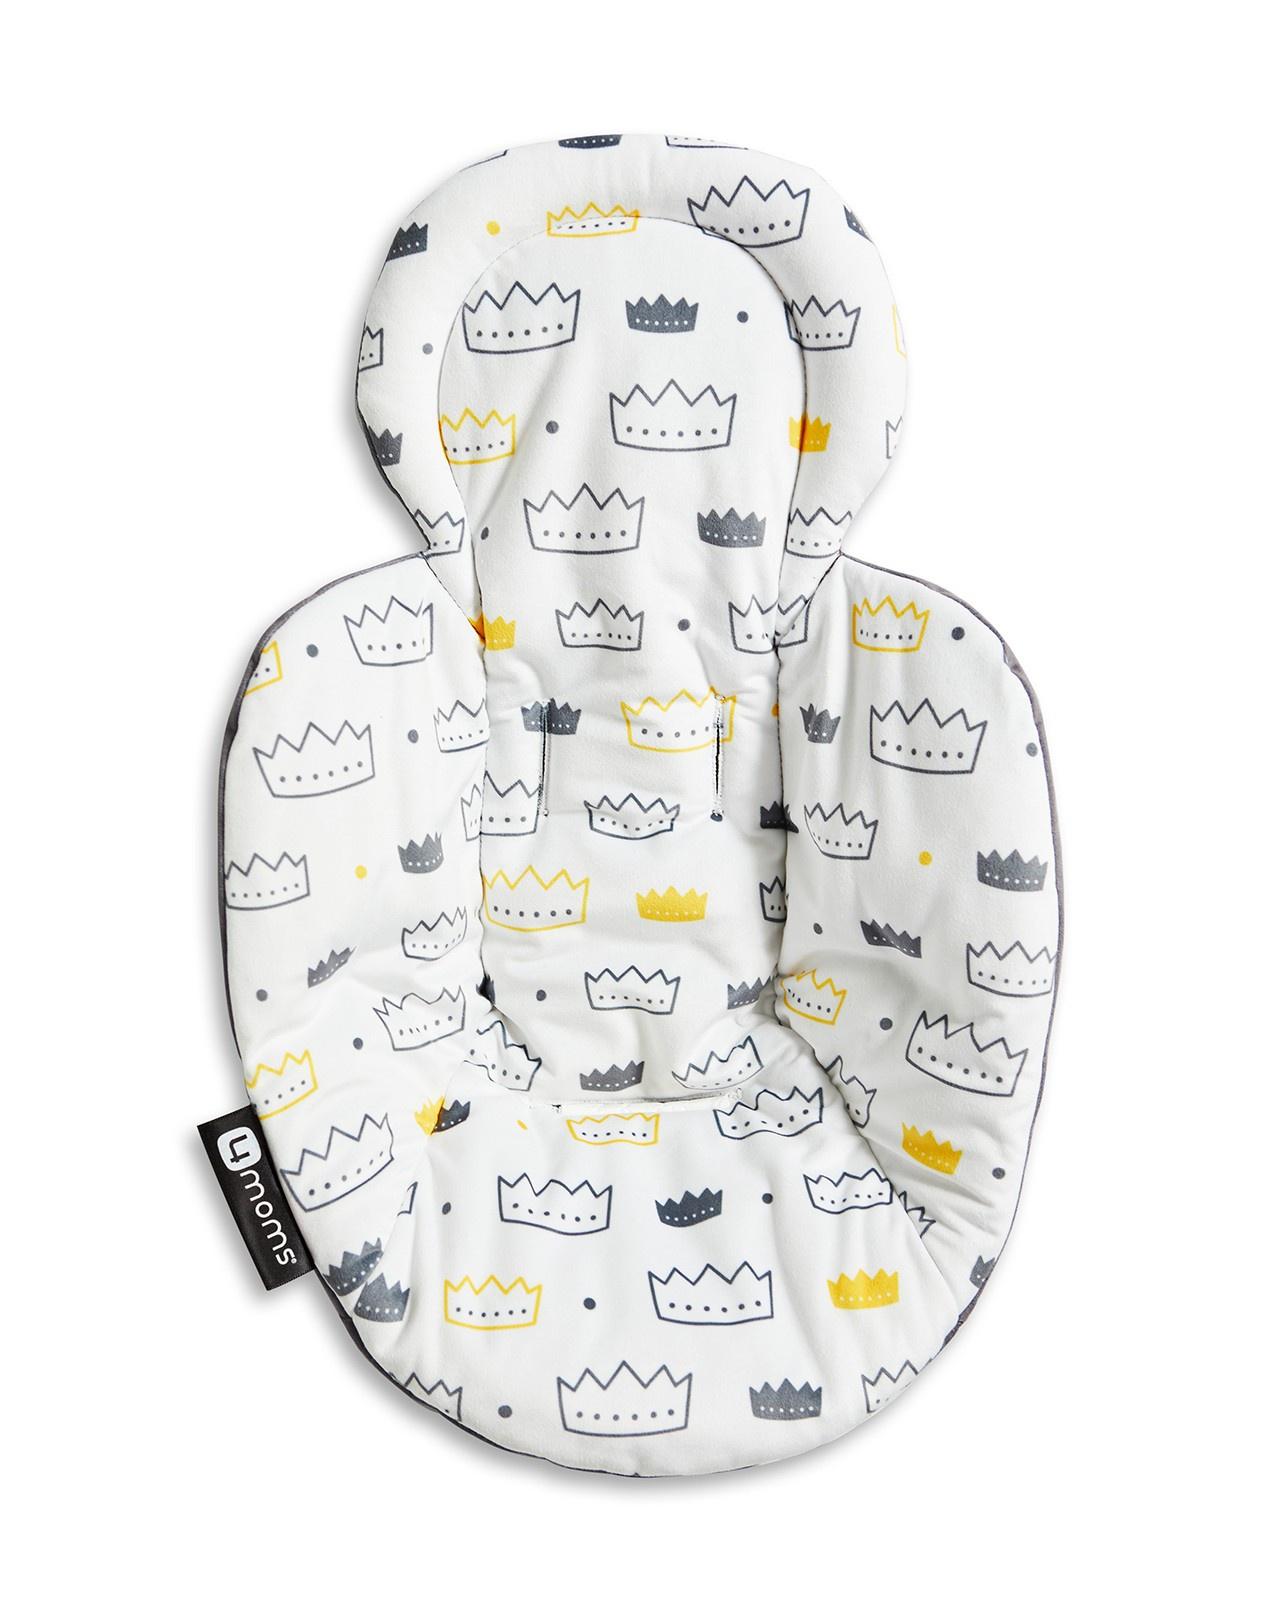 Вкладыш для шезлонга 4moms Вкладыш для новорожденного Little Royal электронный шезлонг качалка 4moms mamaroo 4 серый плюш